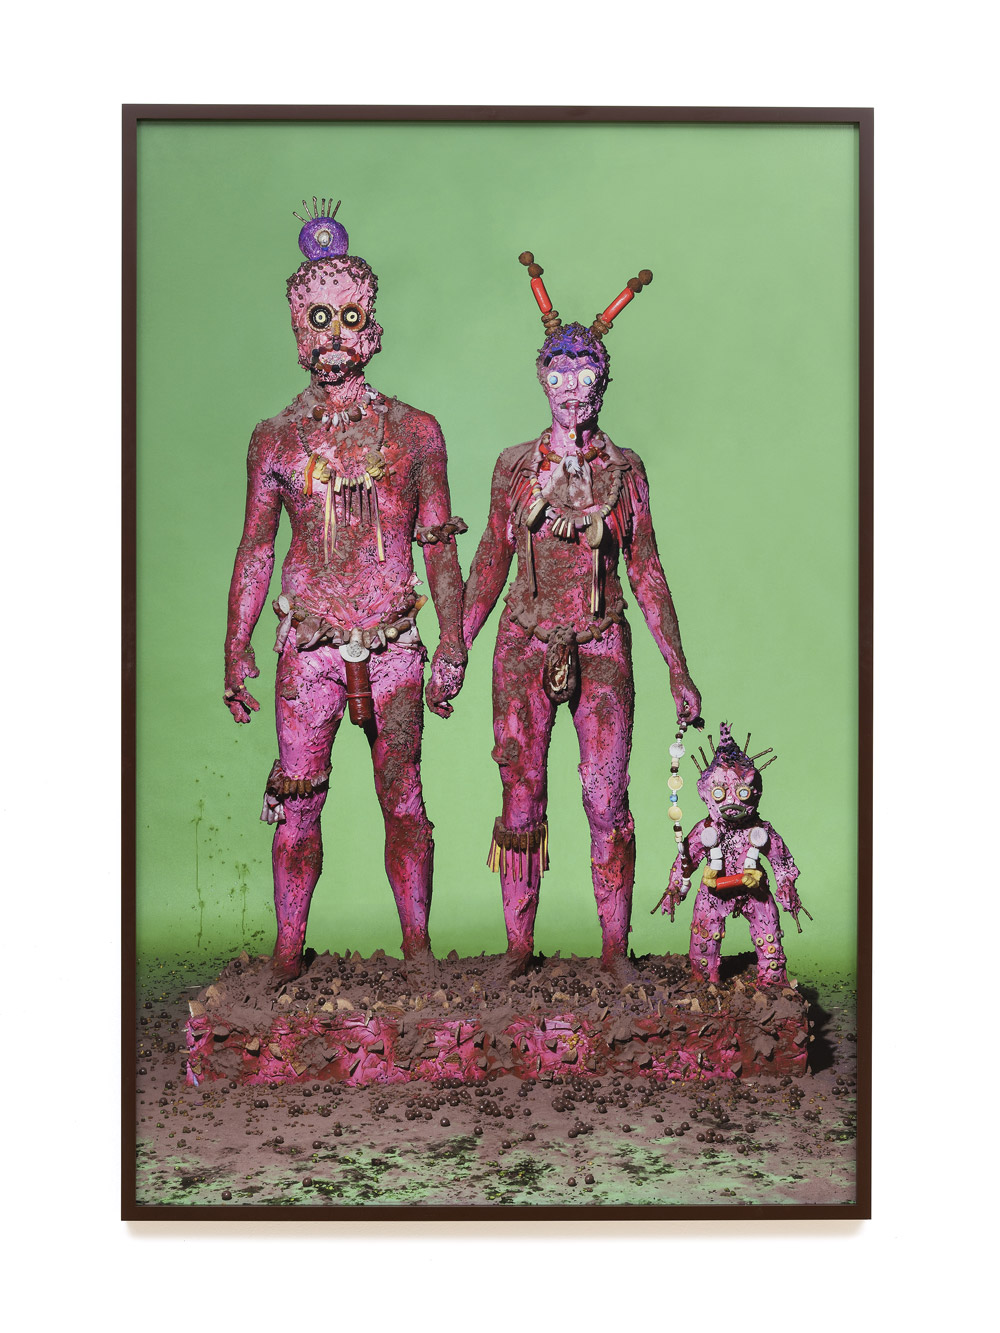 James Ostrer EF 145.6 2014 152 x 101 cm archival pigment print on diasec mount Edition of 1 2 AP 1